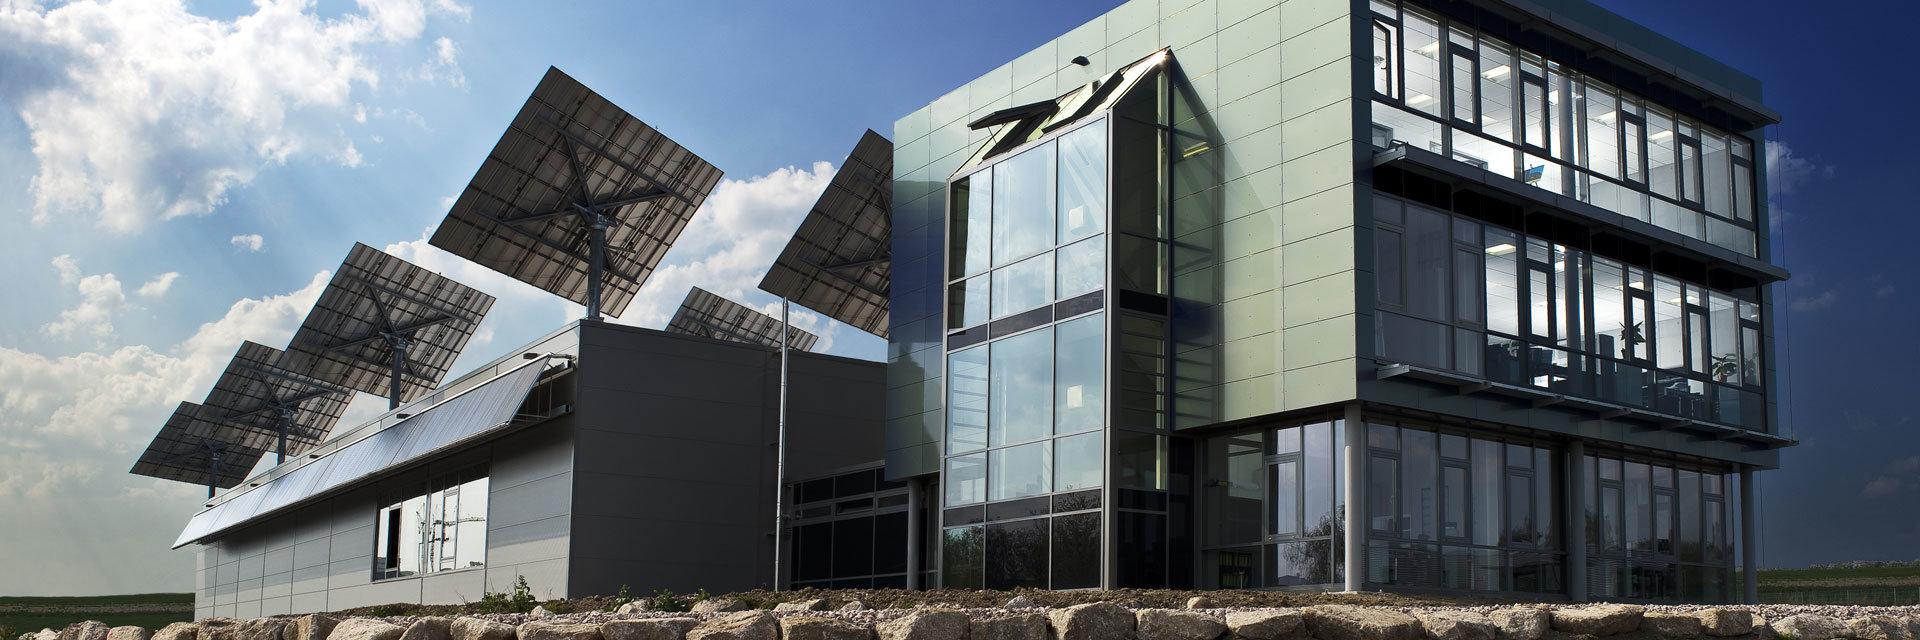 myCleantechSolarTracker™ Solaranalage - Bürobebäude